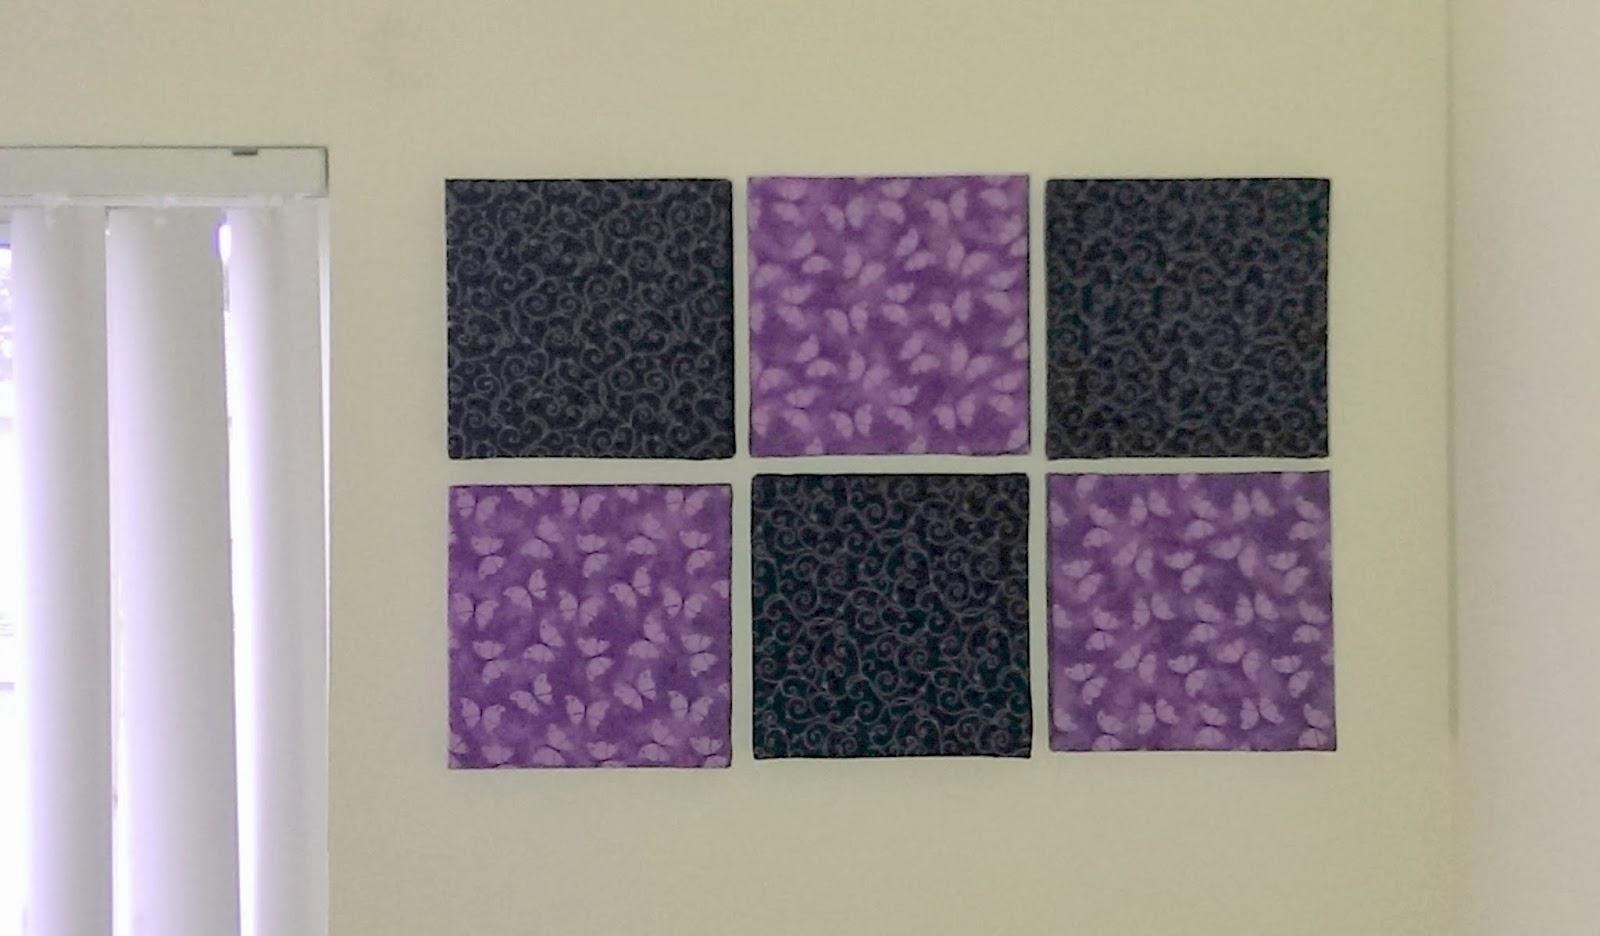 Diy Addiction: Wall Art - Fabric Covered Canvas intended for 2018 Diy Fabric Covered Wall Art